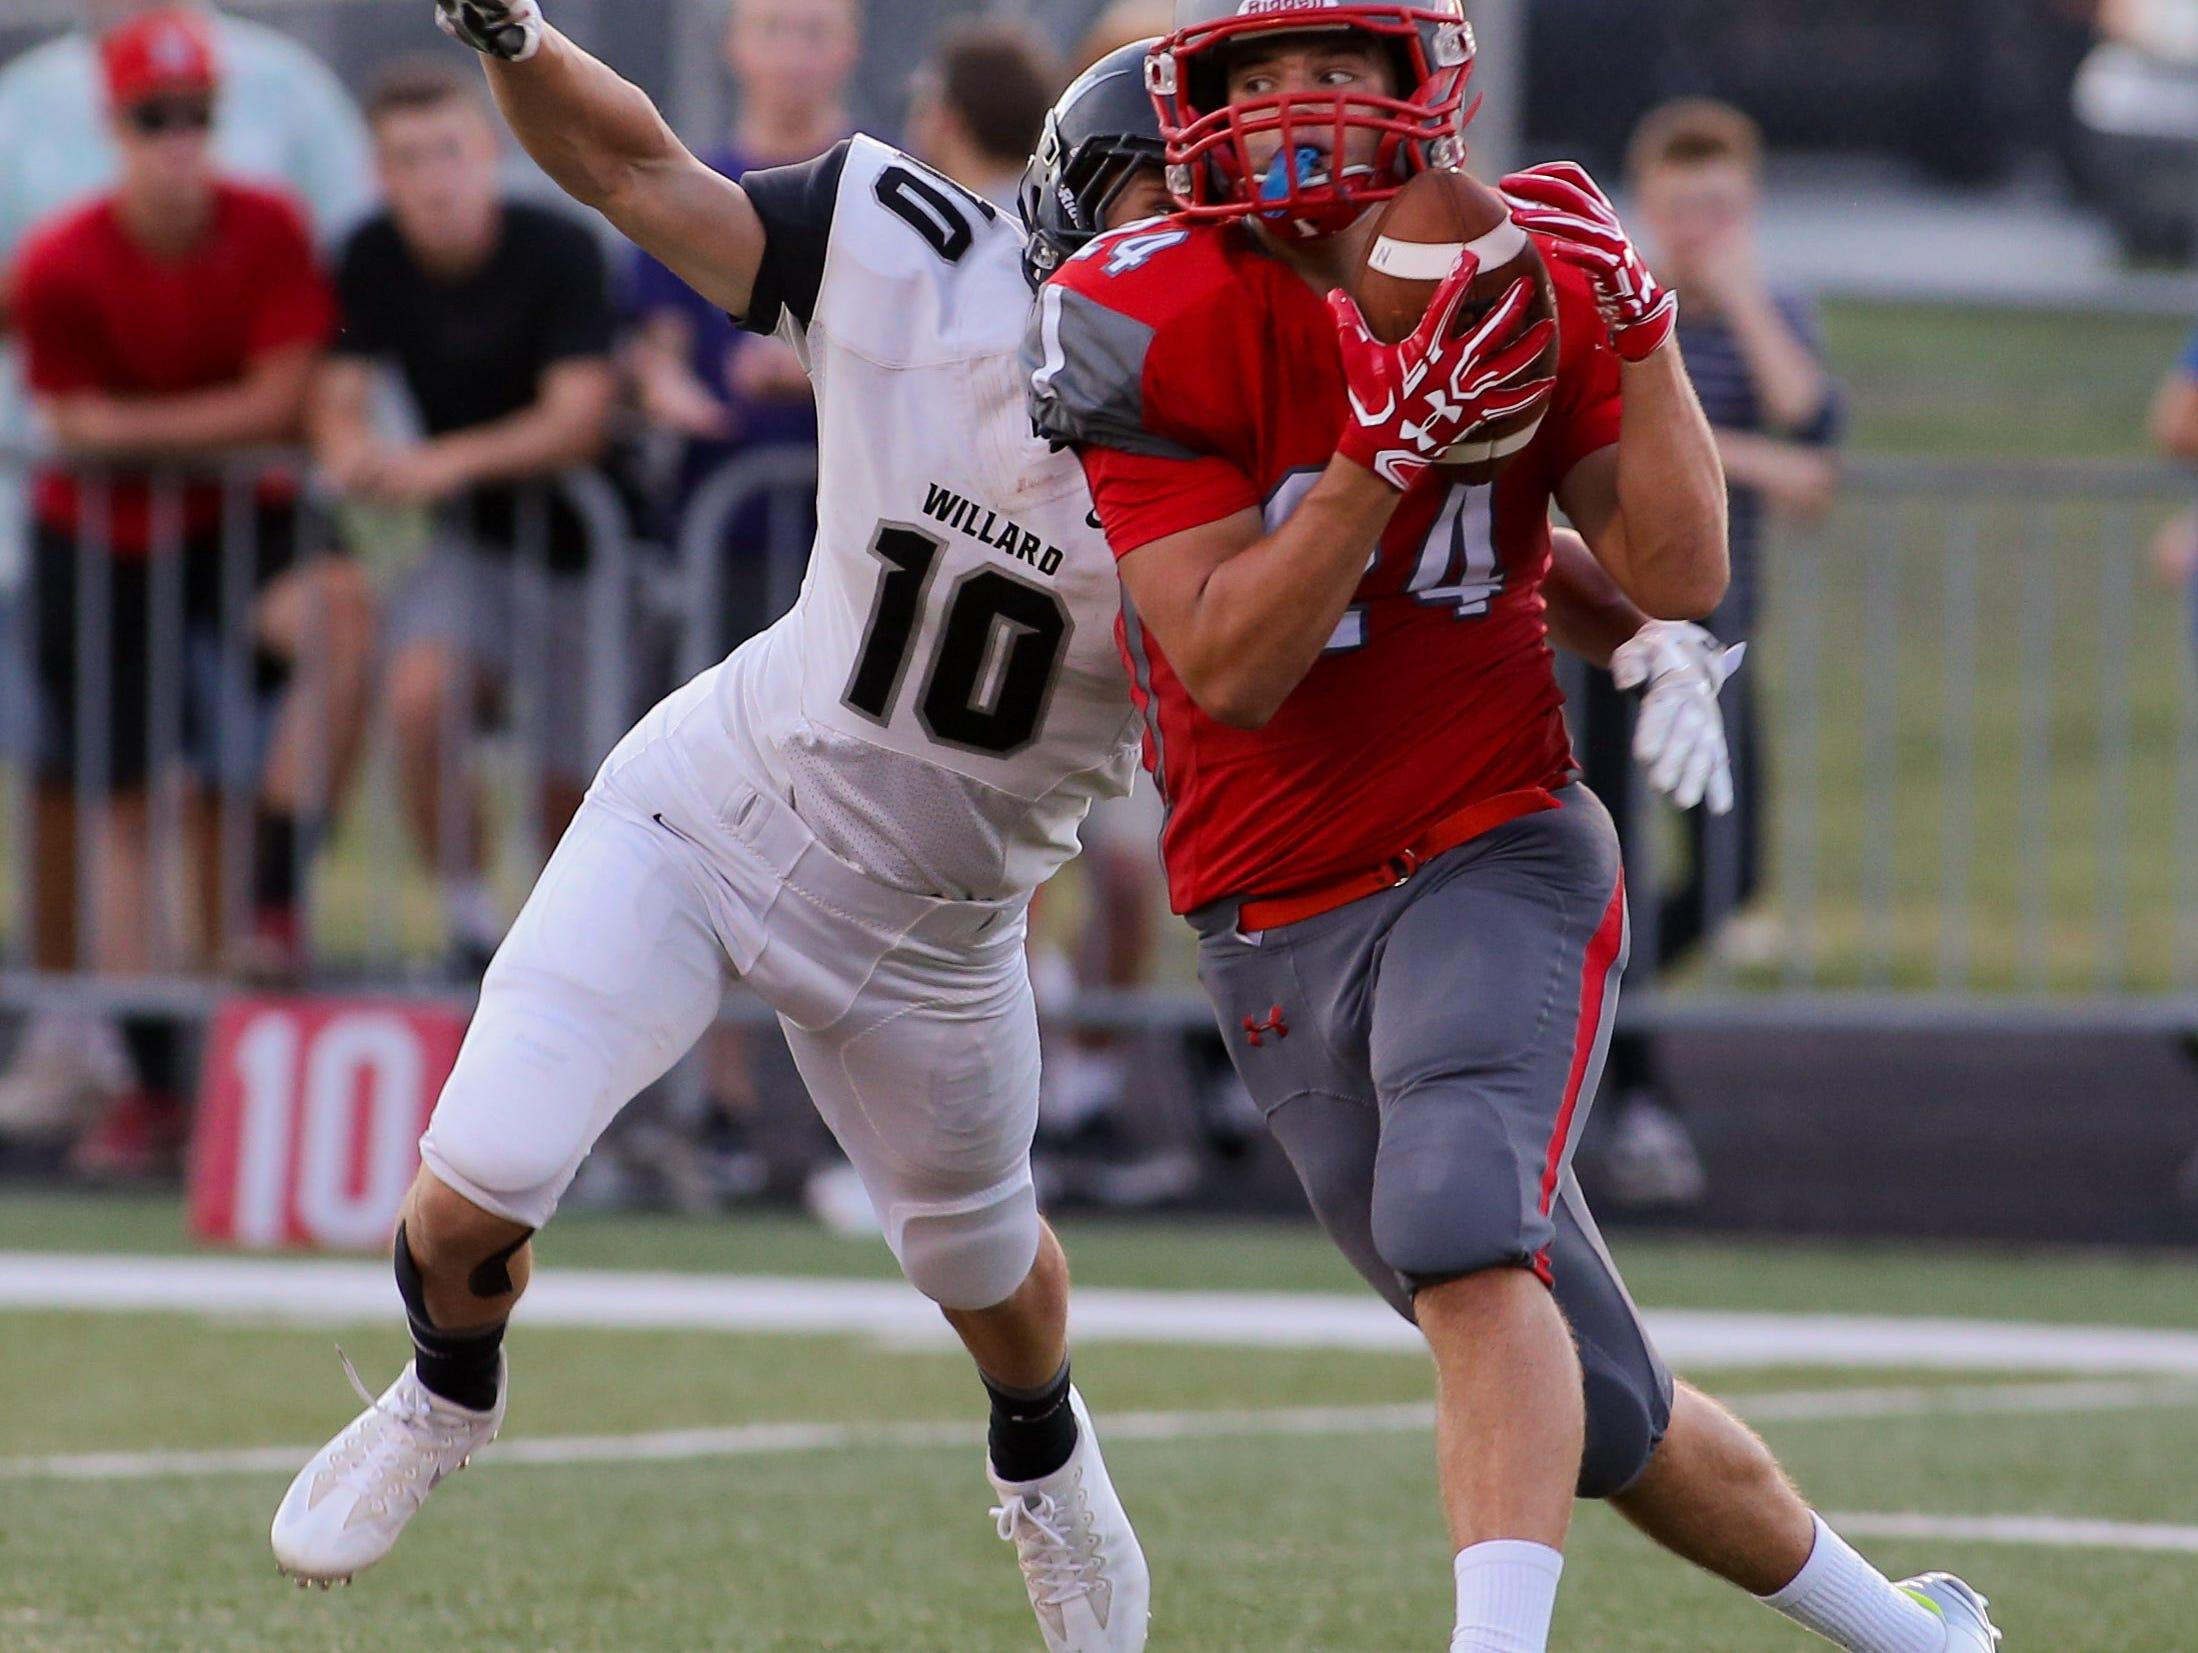 Nixa High School's Evan Deveney catches a pass against Willard High School Friday, August 19, 2016. Jason Connel / For the News-Leader